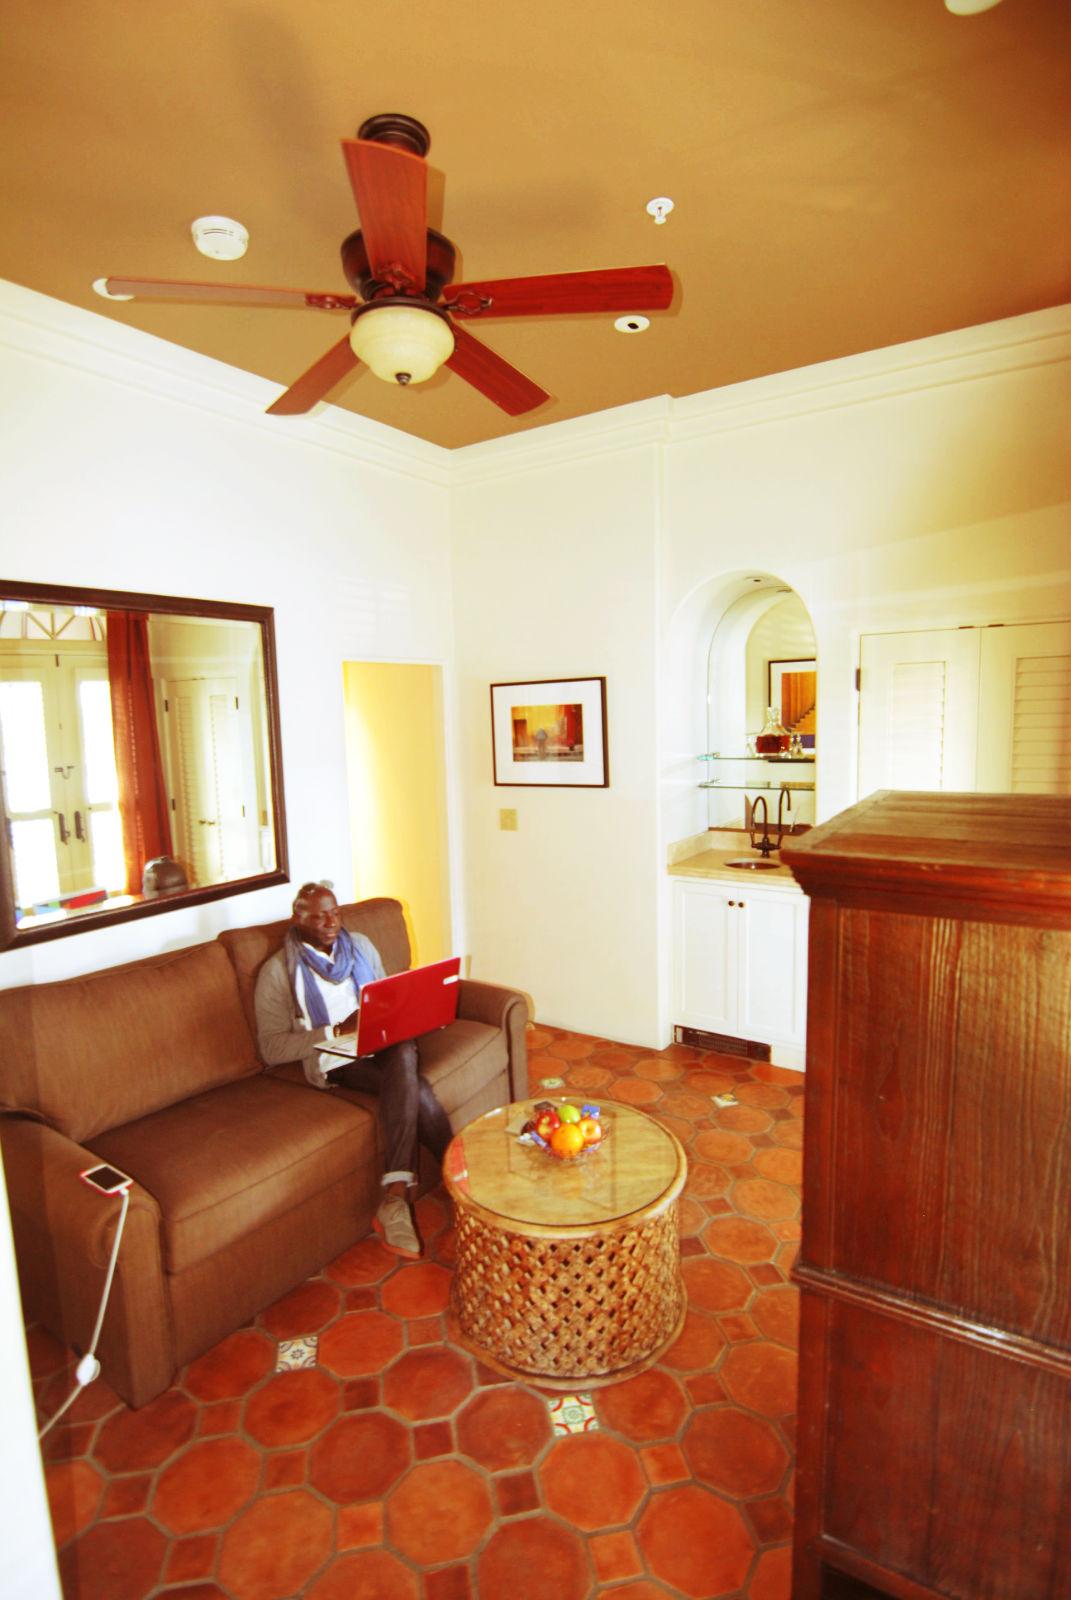 Sitting Room, King Deluxe Suite, Cypress Inn, Carmel, CA